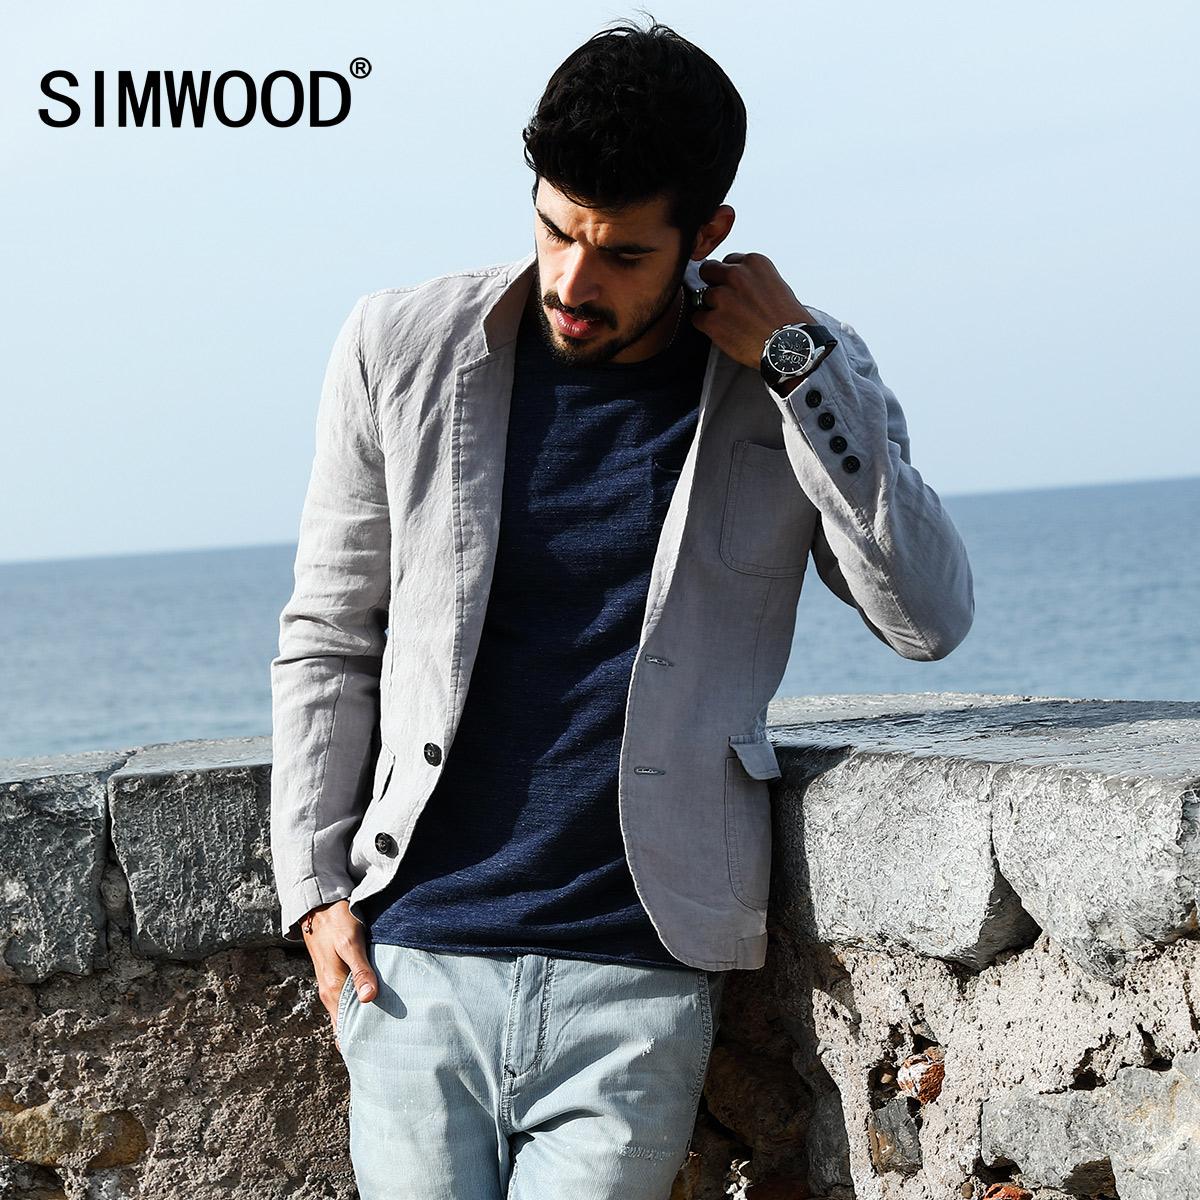 Simwood简木男装秋冬季新款薄亚麻修身单西服男士休闲小西装外套